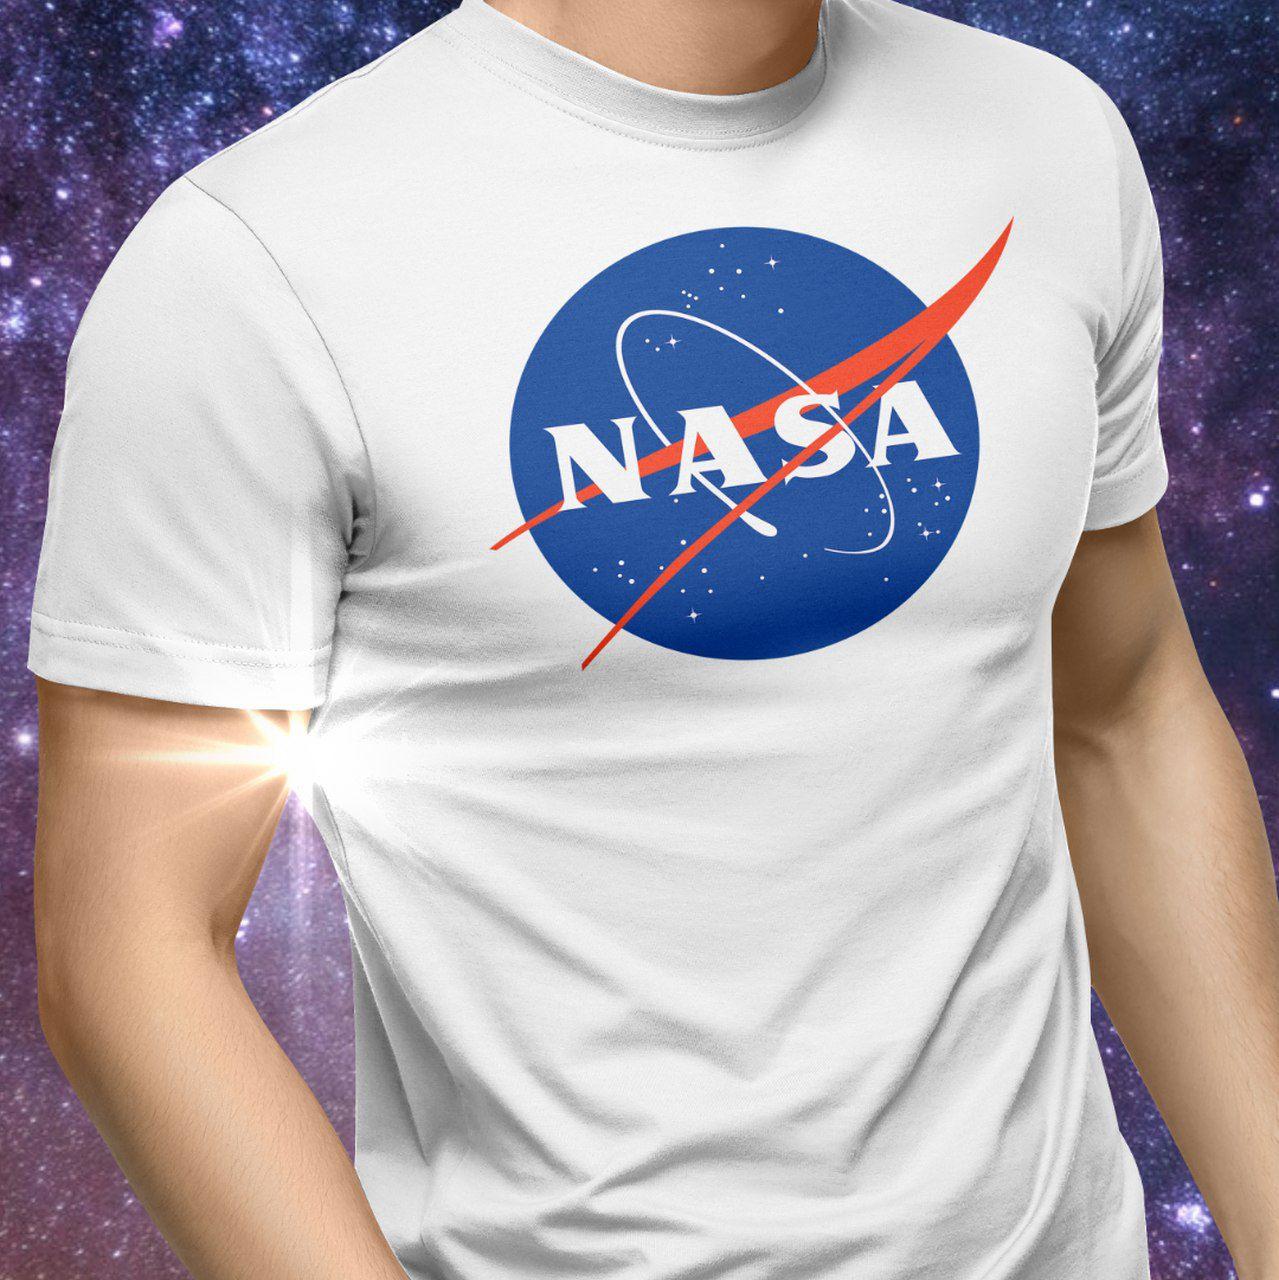 Camiseta NASA (Branca)